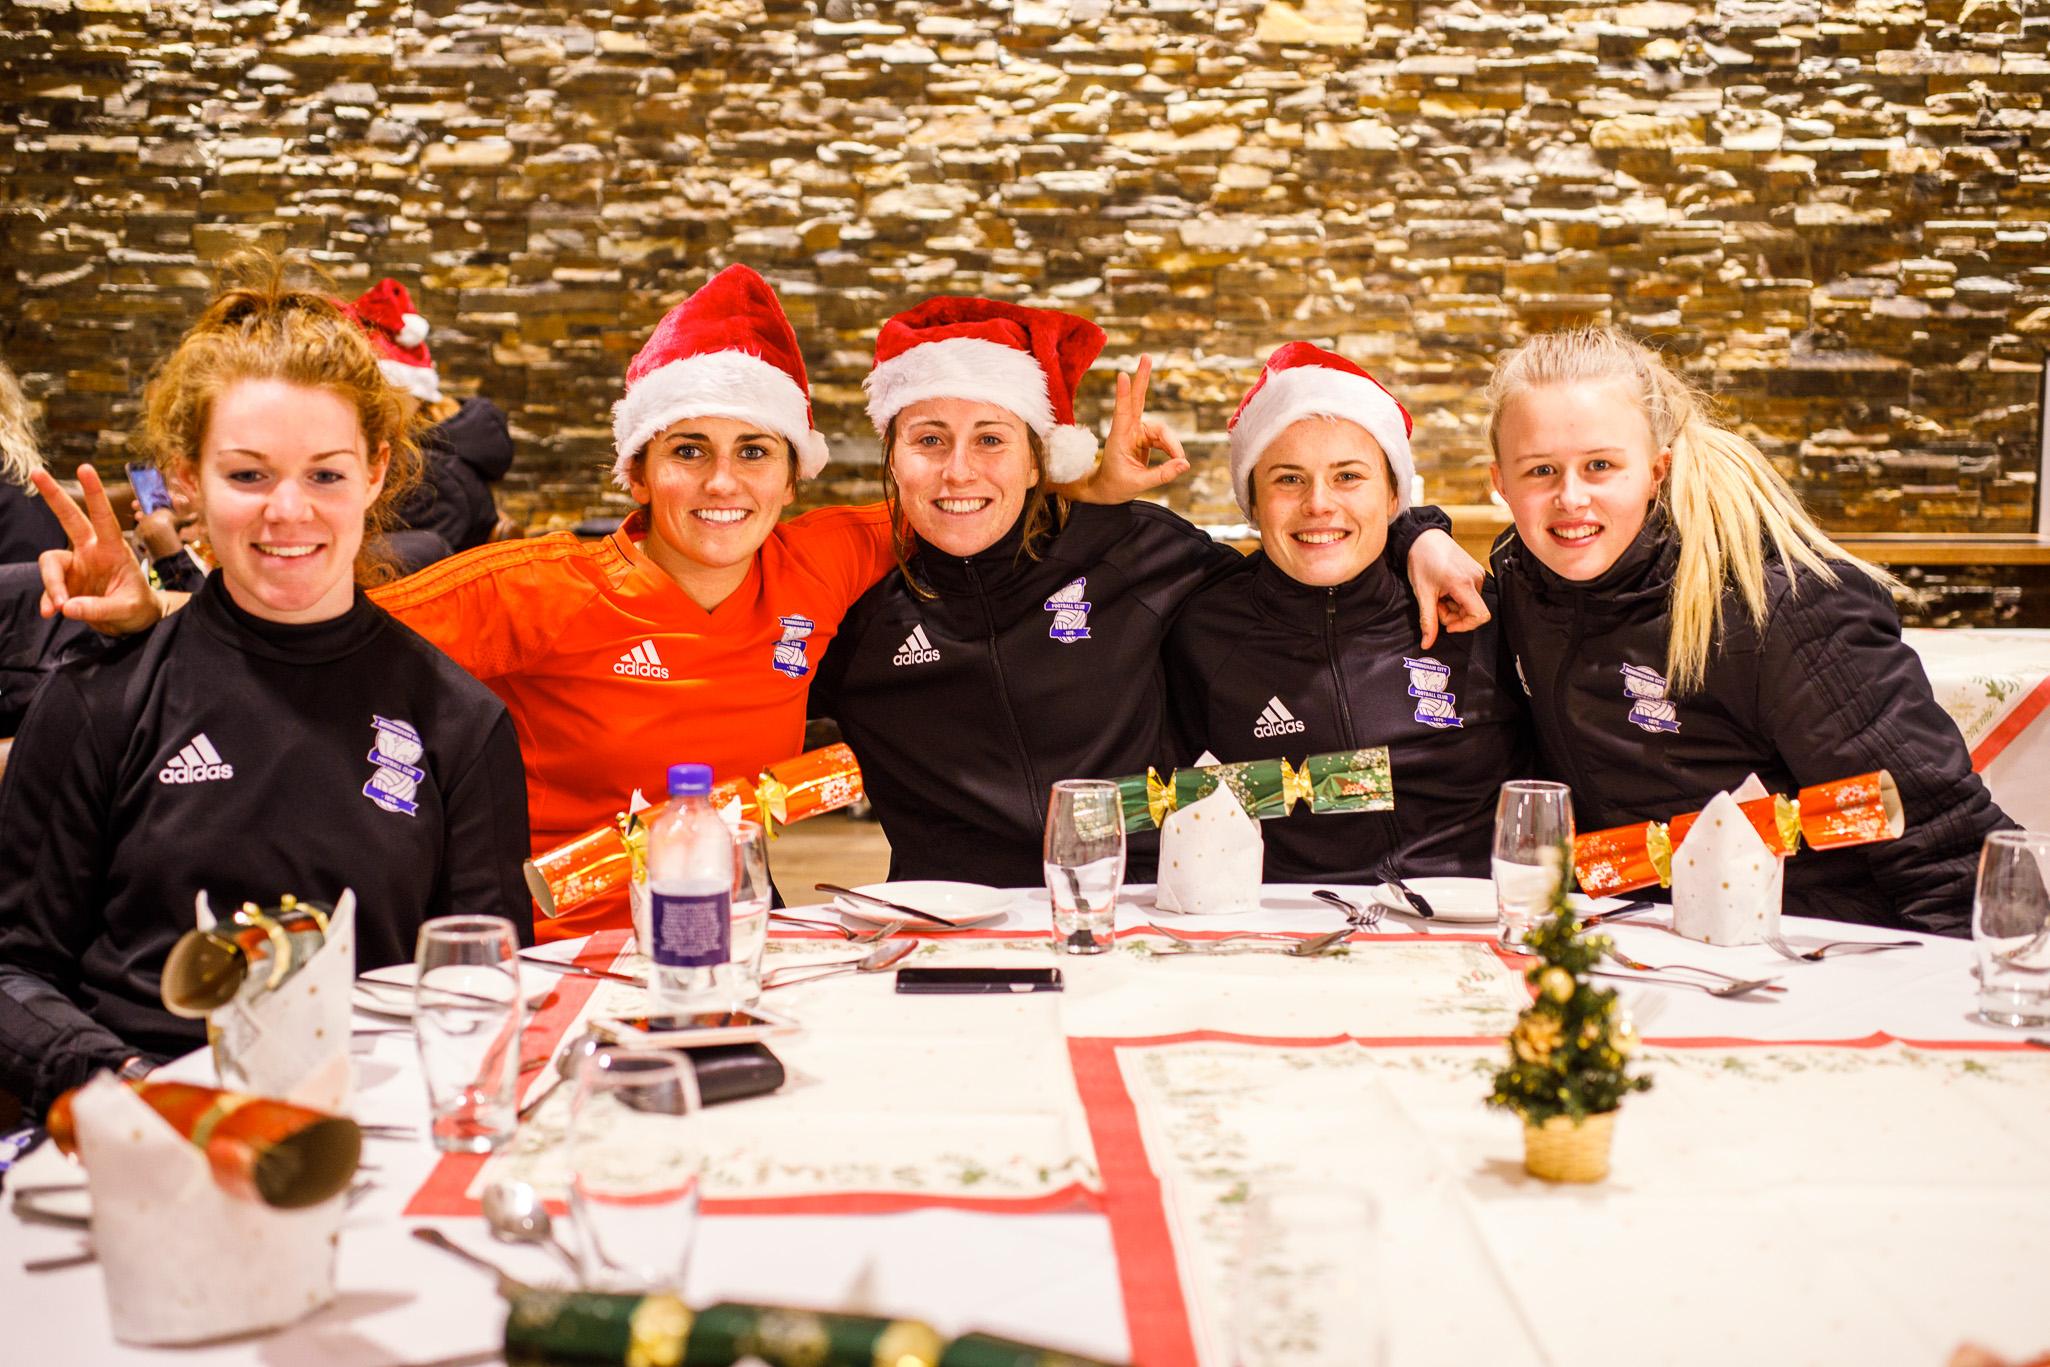 Birmingham City Ladies FC enjoying the full table service